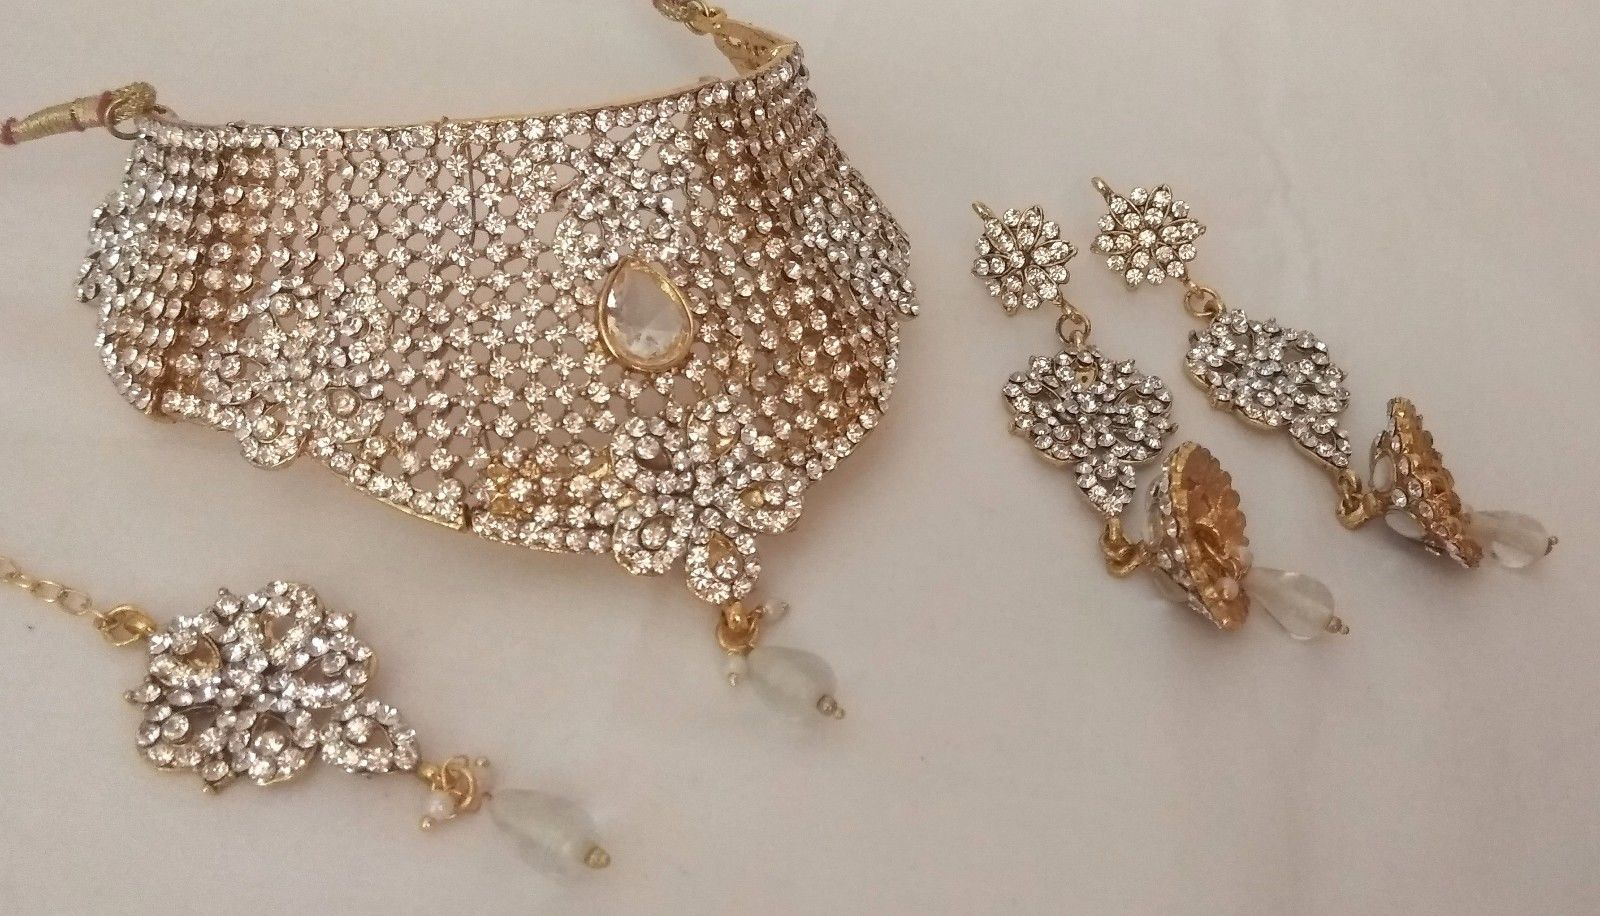 Indian Gold Plated White Rhinestone Choker Bridal Wedding Necklace Jewelry Set - $26.18